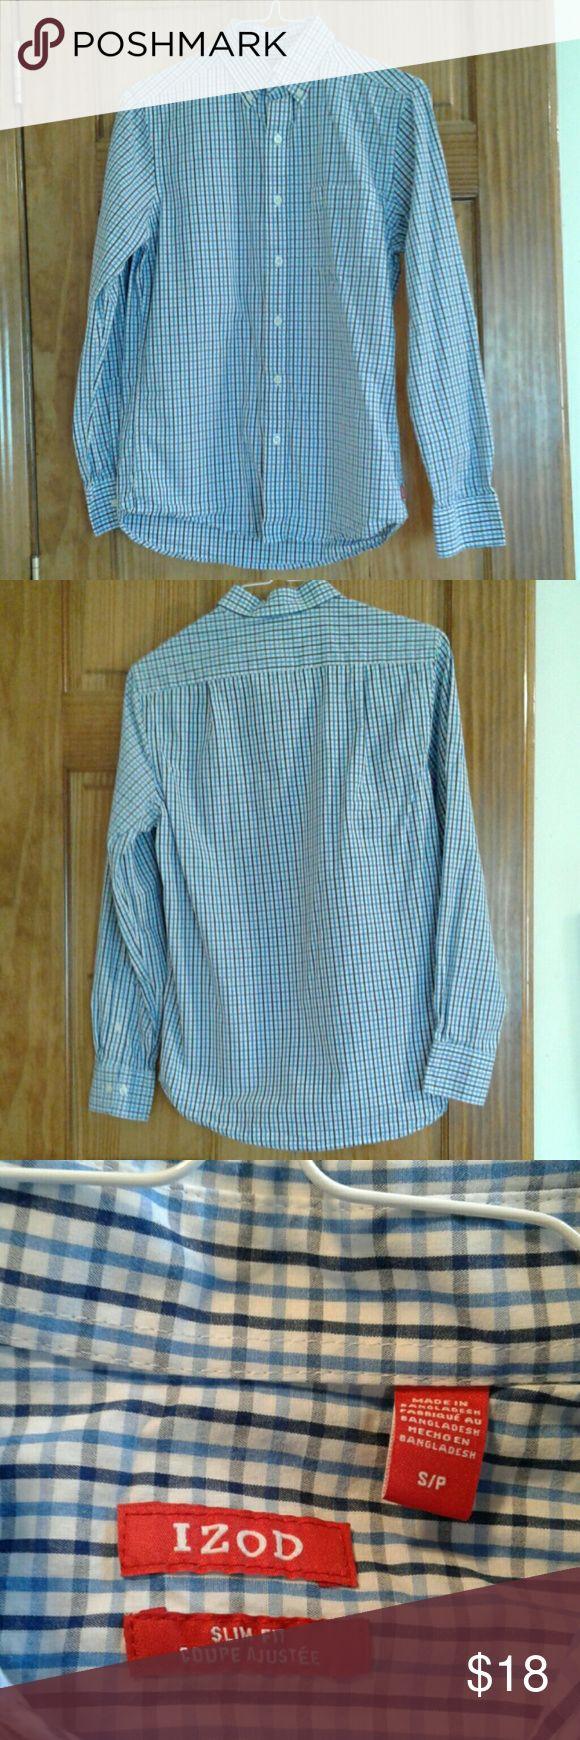 Izod men's plaid  shirt slim fit small Izod men's plaid shirt slim fit small 100% cotton Izod Shirts Casual Button Down Shirts